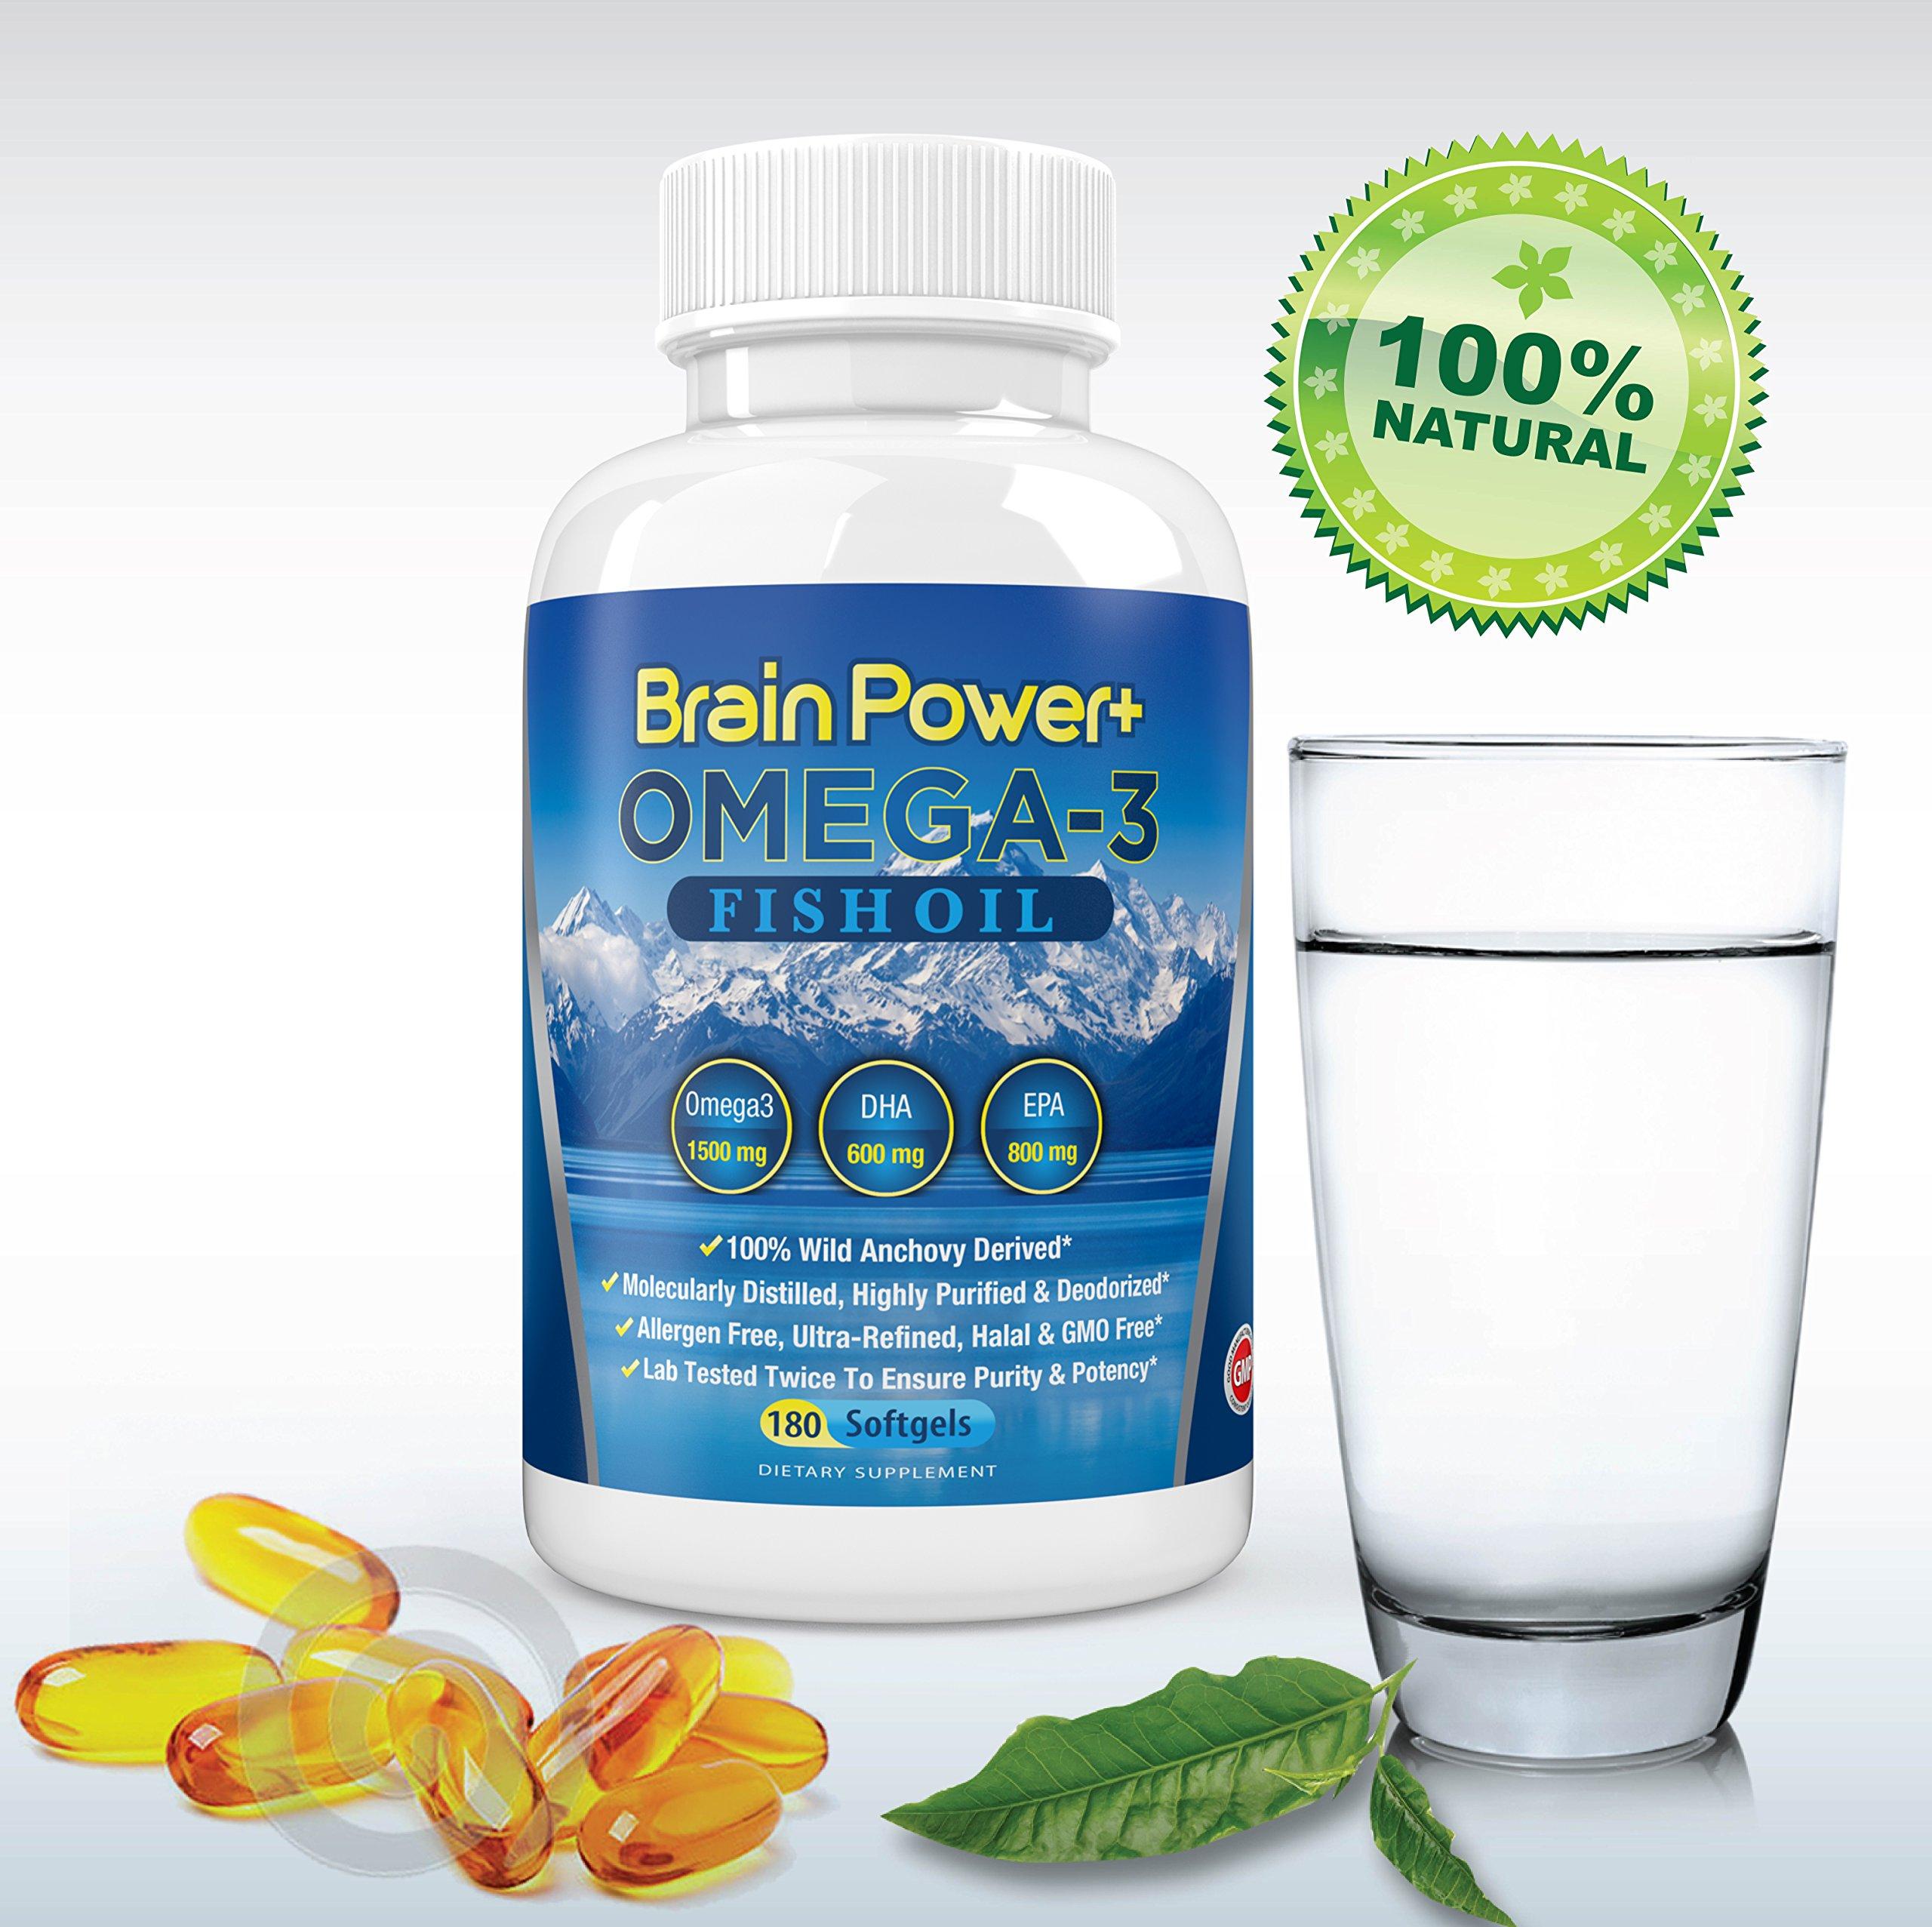 Omega 3 Fish Oil Burpless | 1500 mg Omega-3, 800 mg EPA, 600 mg DHA - Triple Strength Pharmaceutical Grade Liquid Softgel Capsules - 180 Count - Full 90 Day Supply